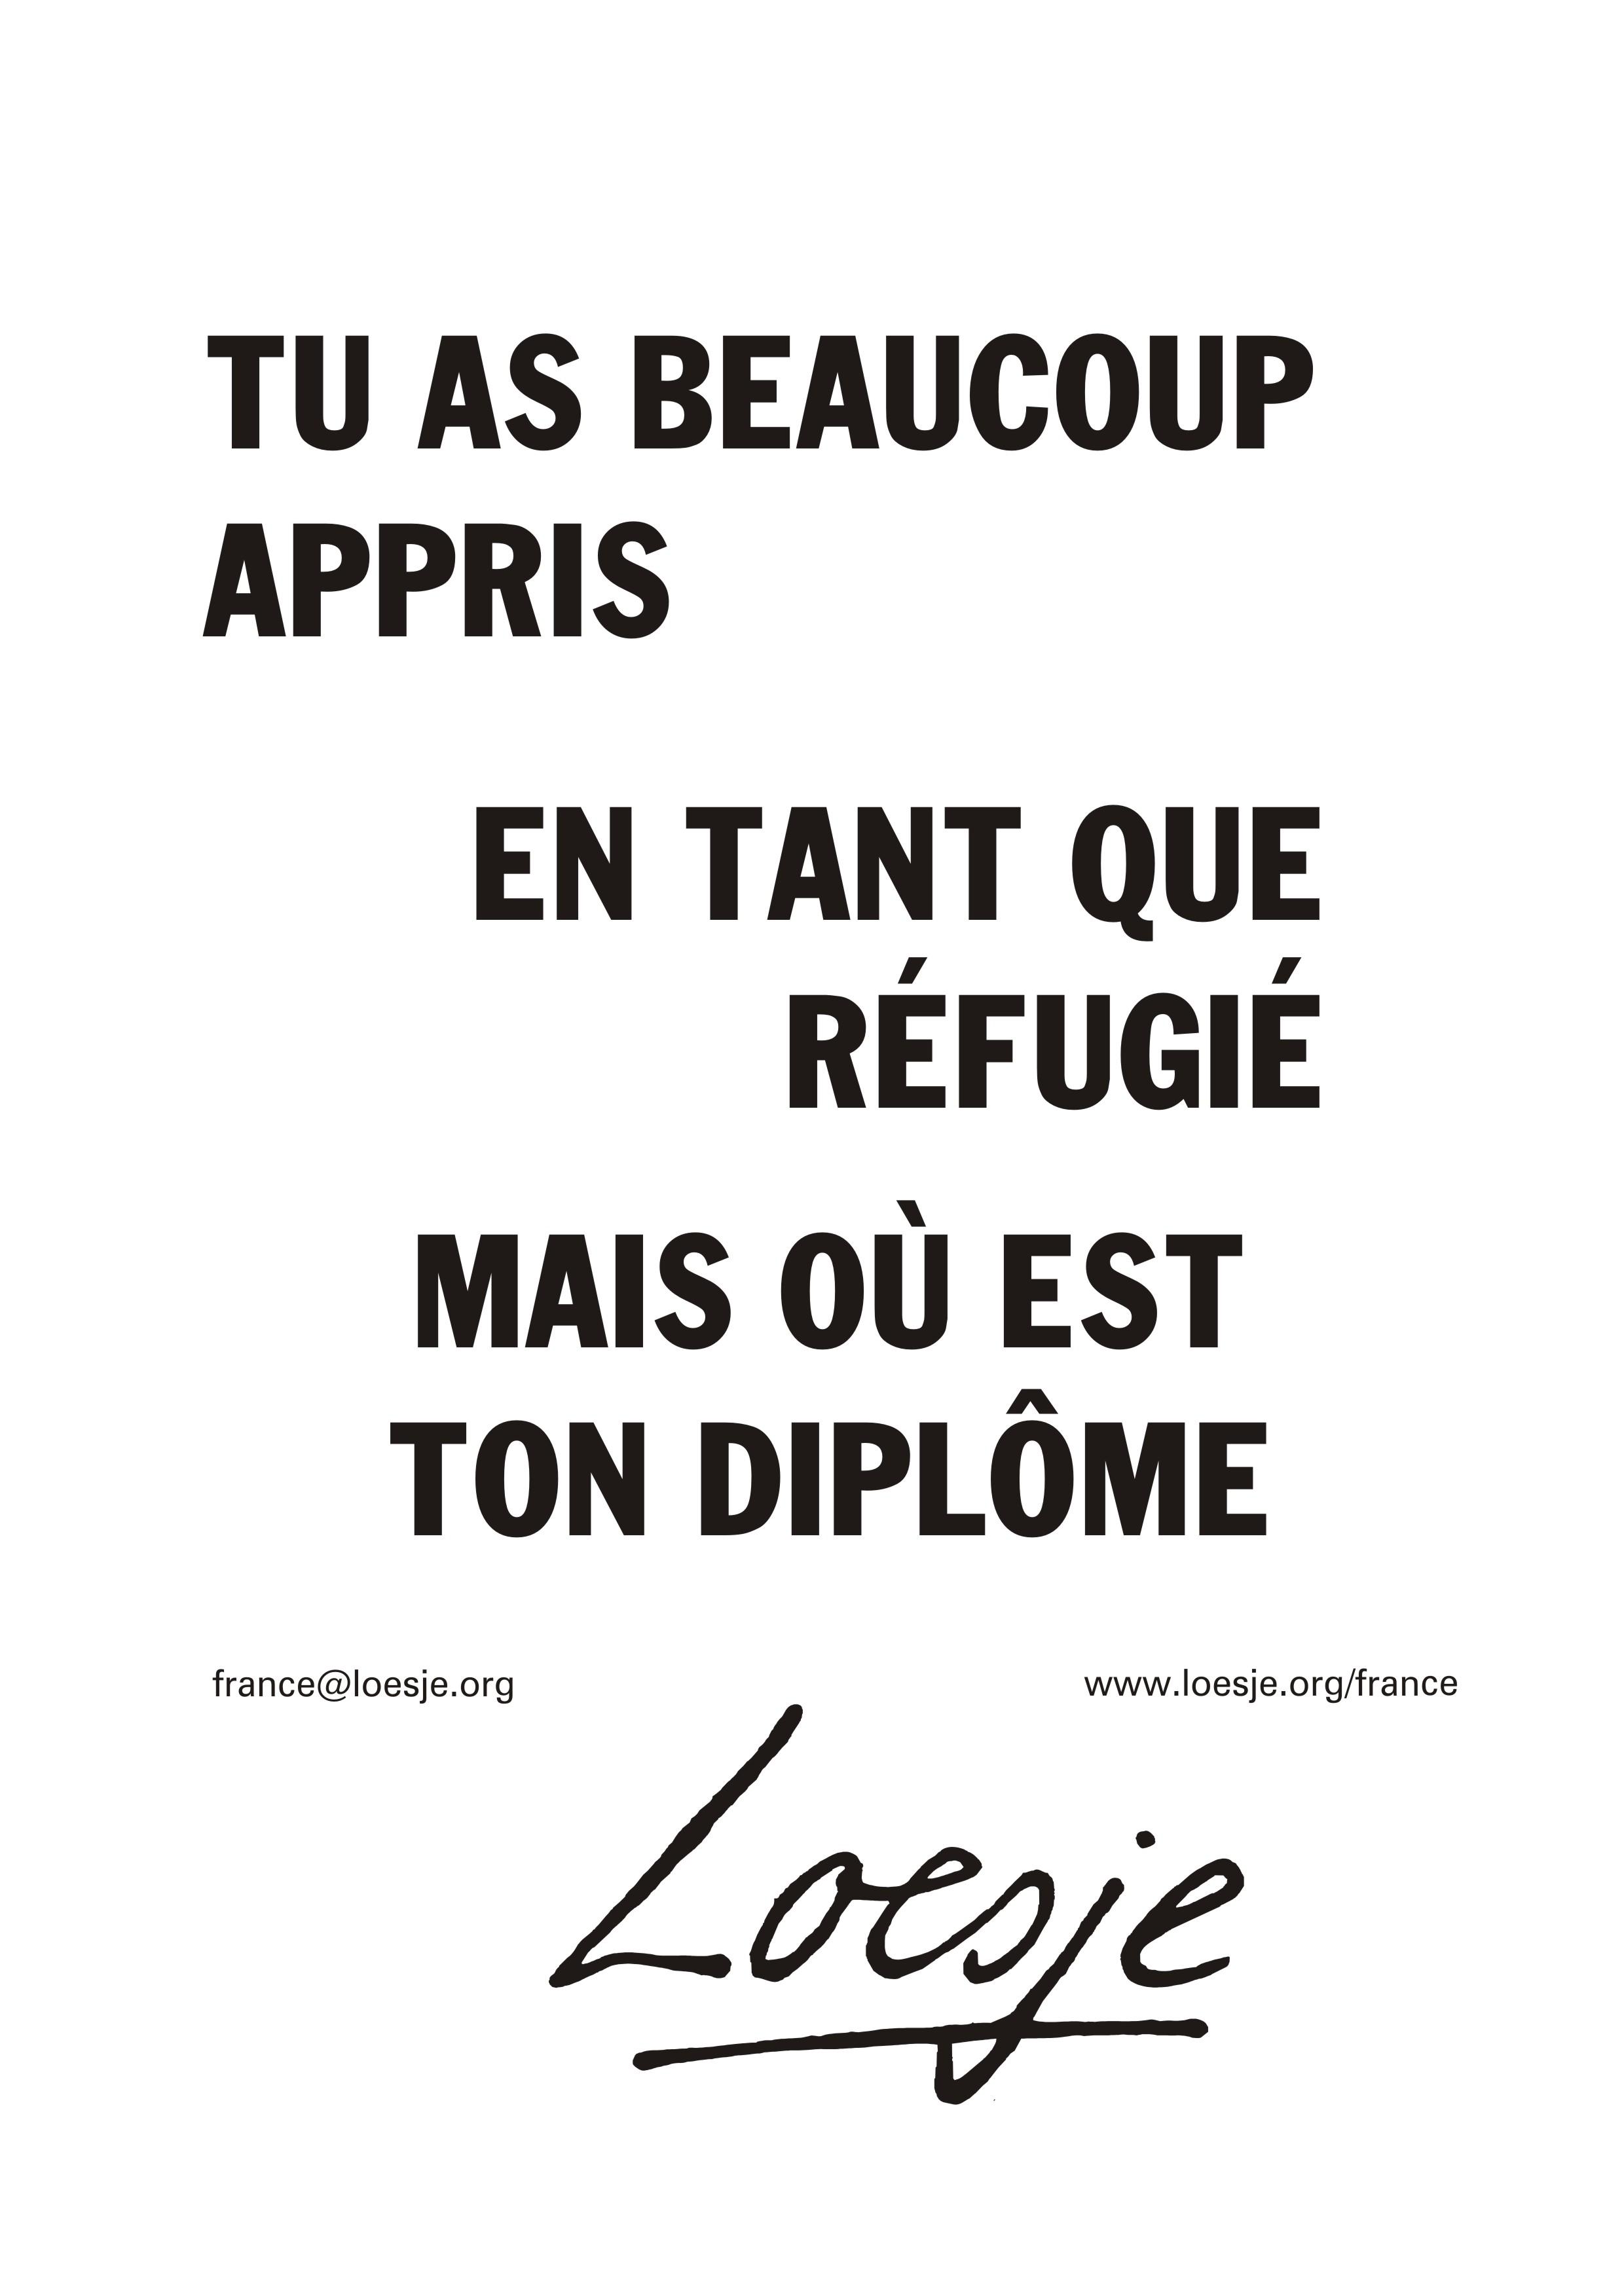 Tu as beaucoup appris en tant que refugie mais ou est ton diplo_e